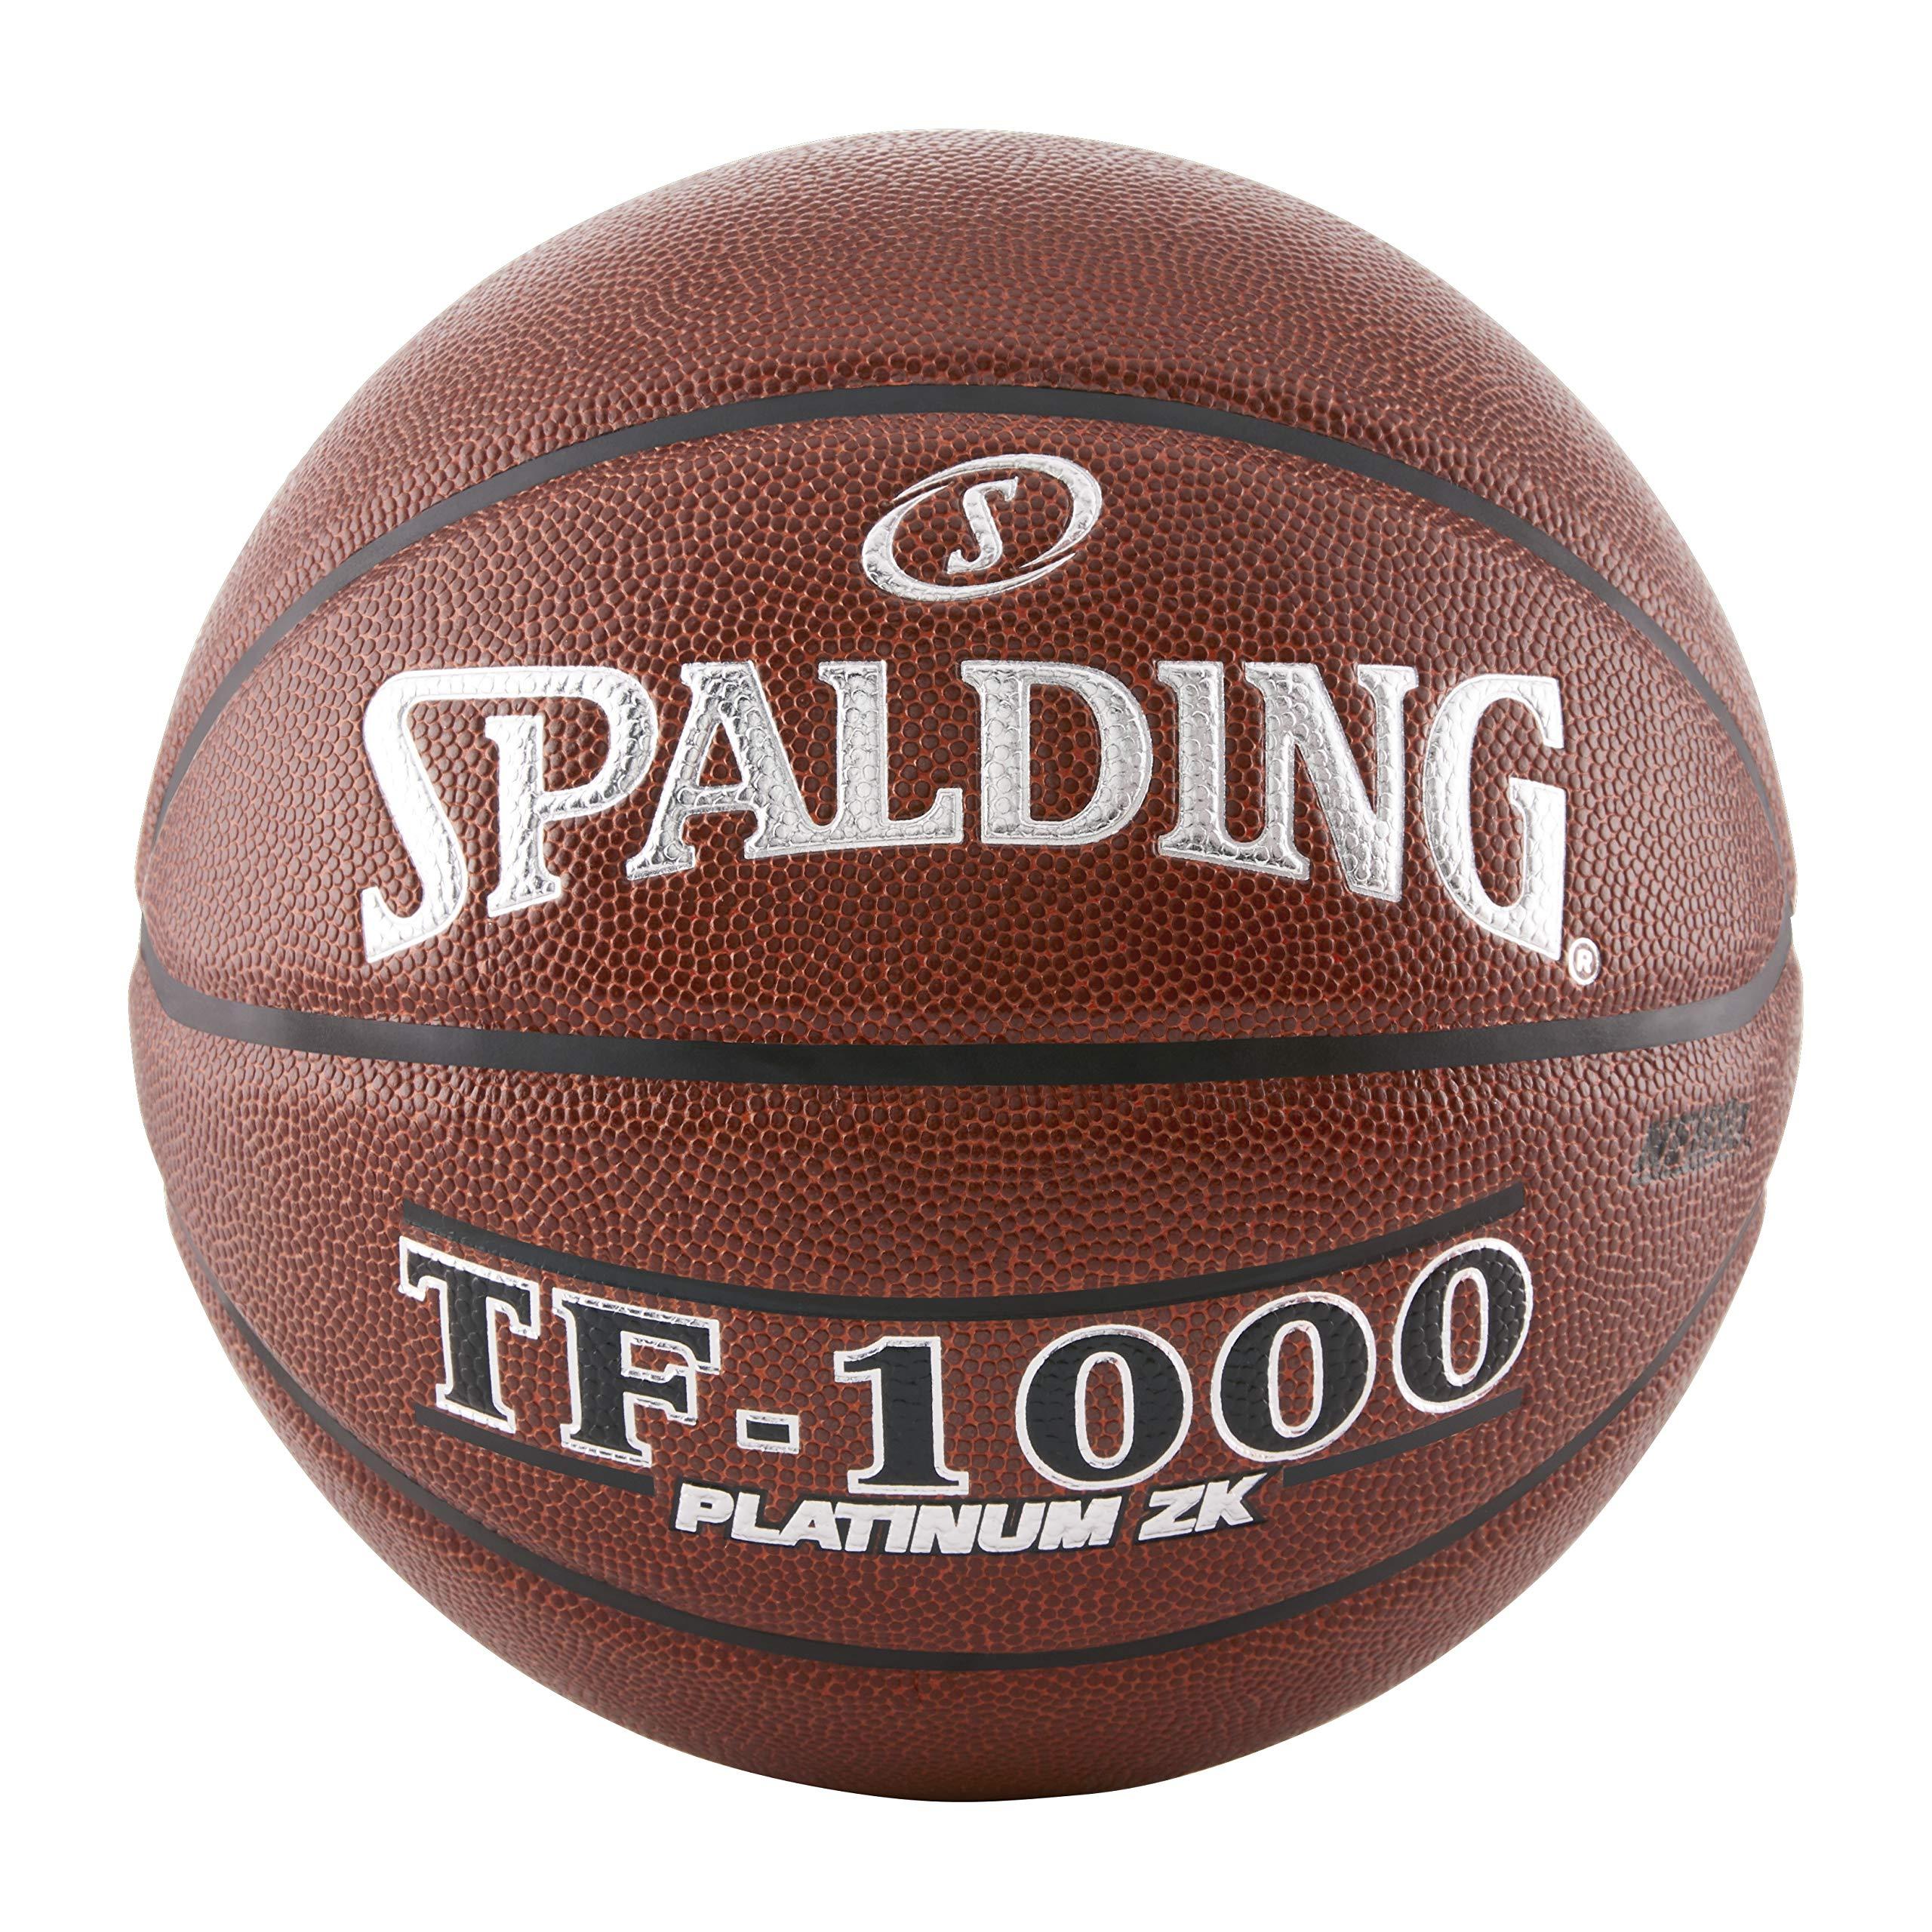 Spalding TF-1000 Platinum ZK - Official (EA)